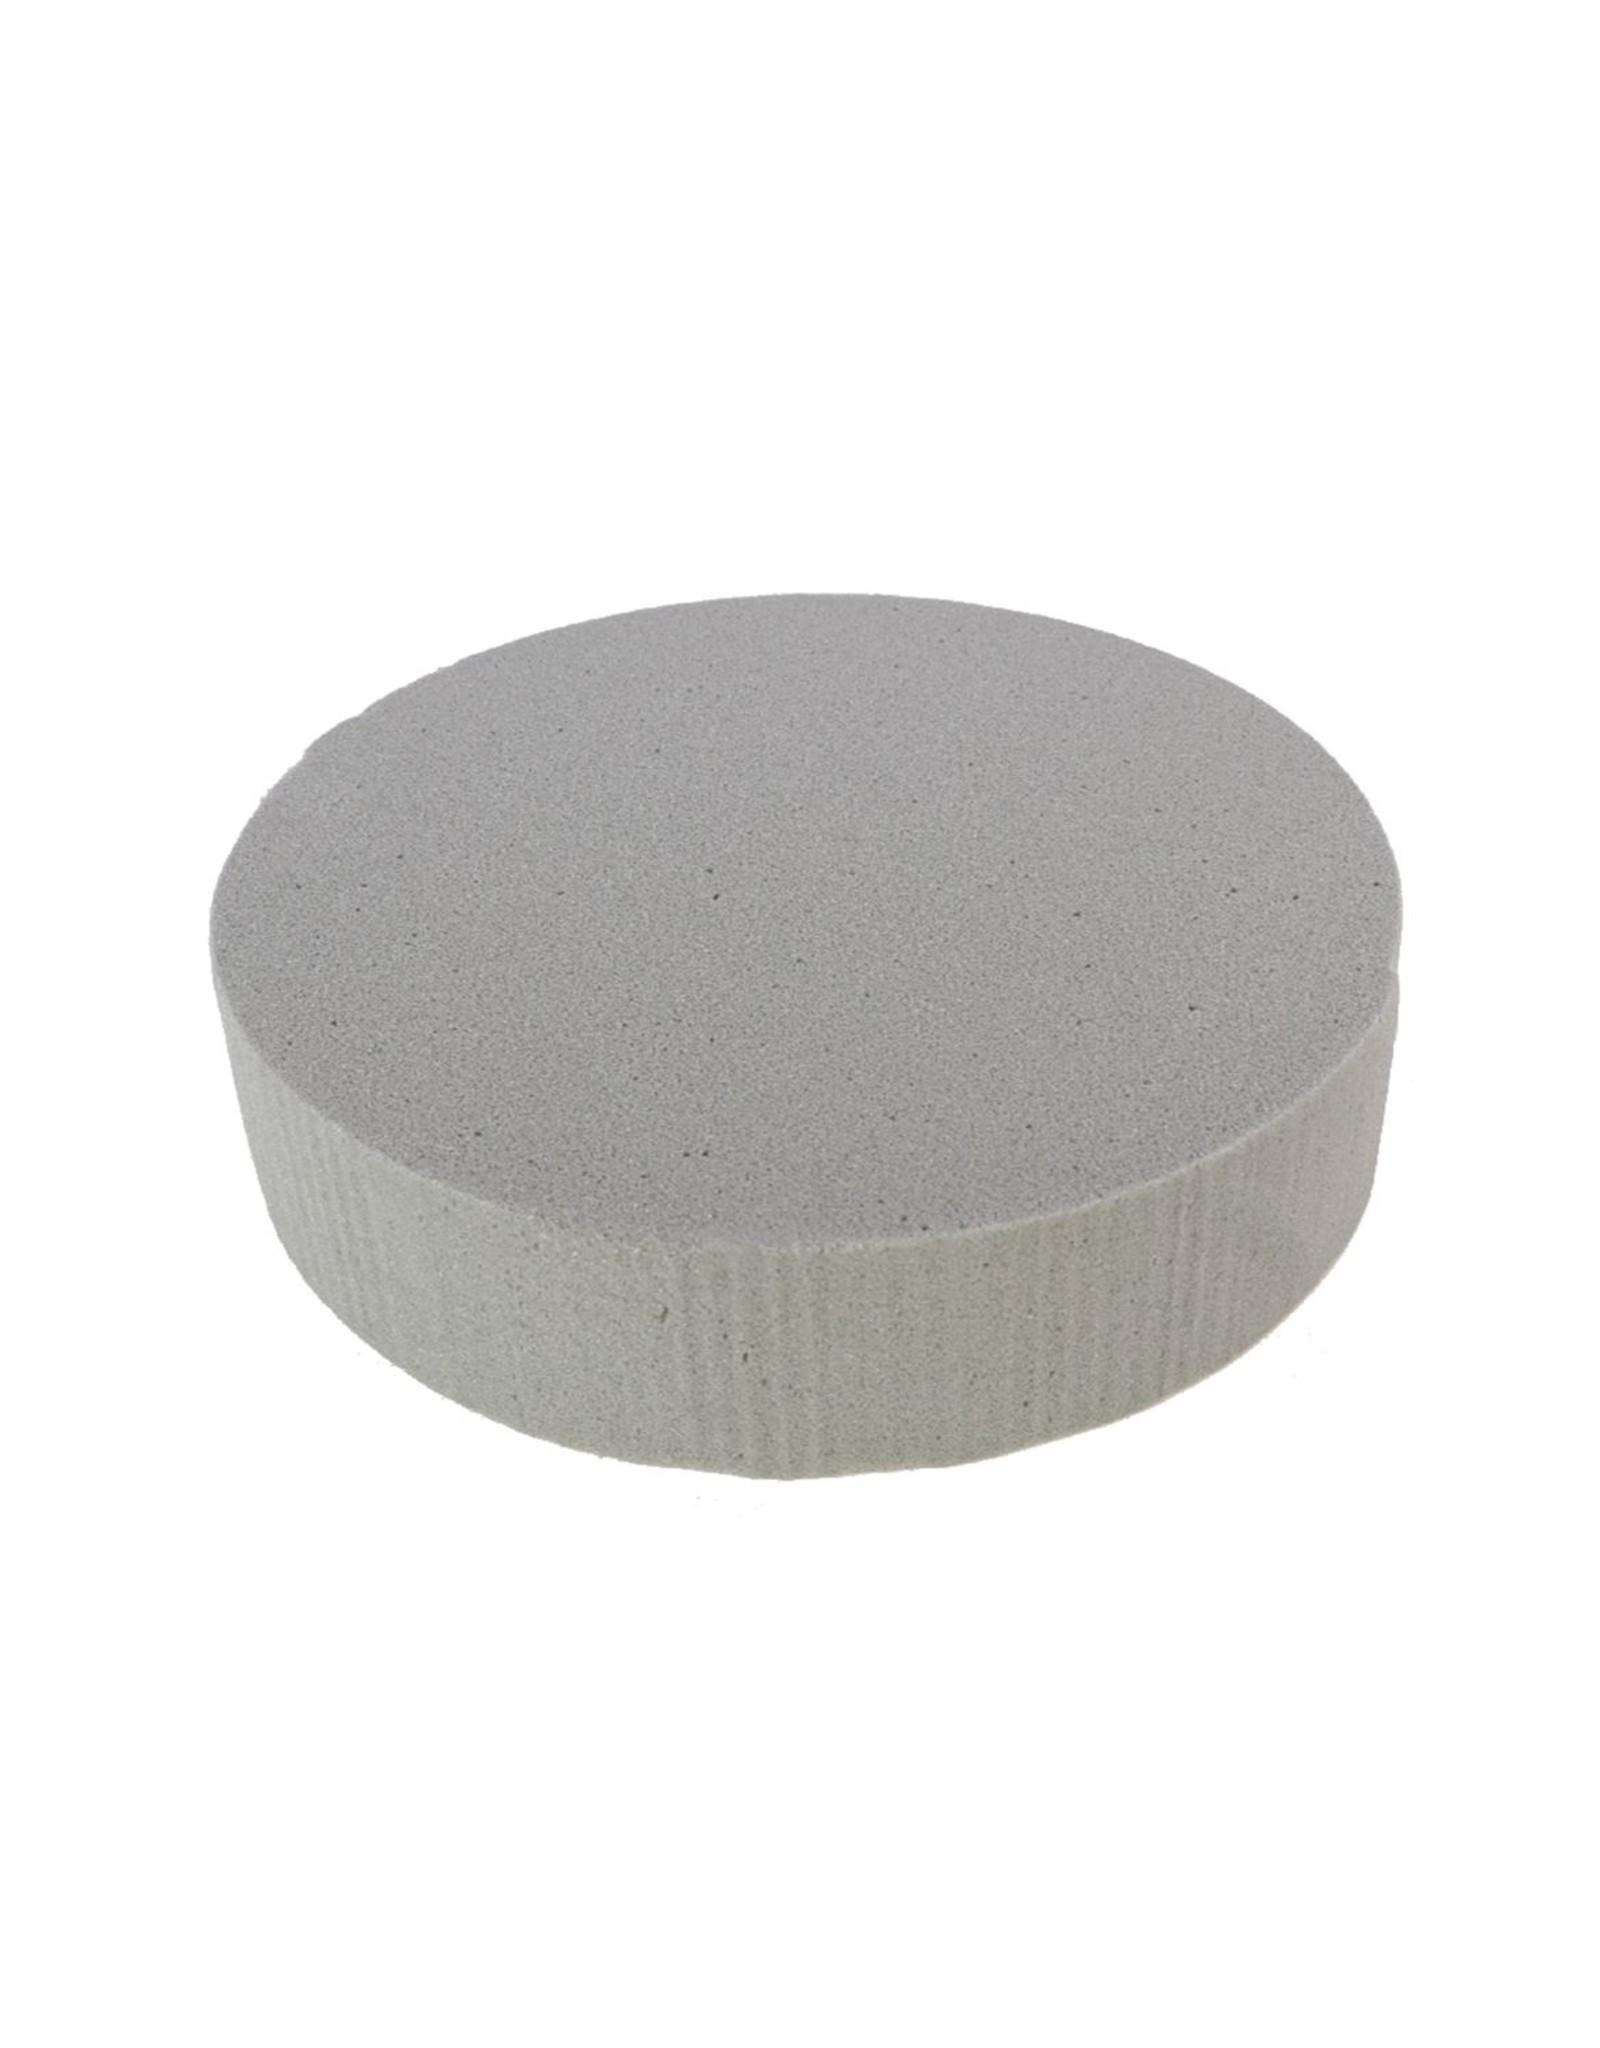 HD Basic Cake Dry Sld Foam Ø30.0 ↑7.0 (x 8)